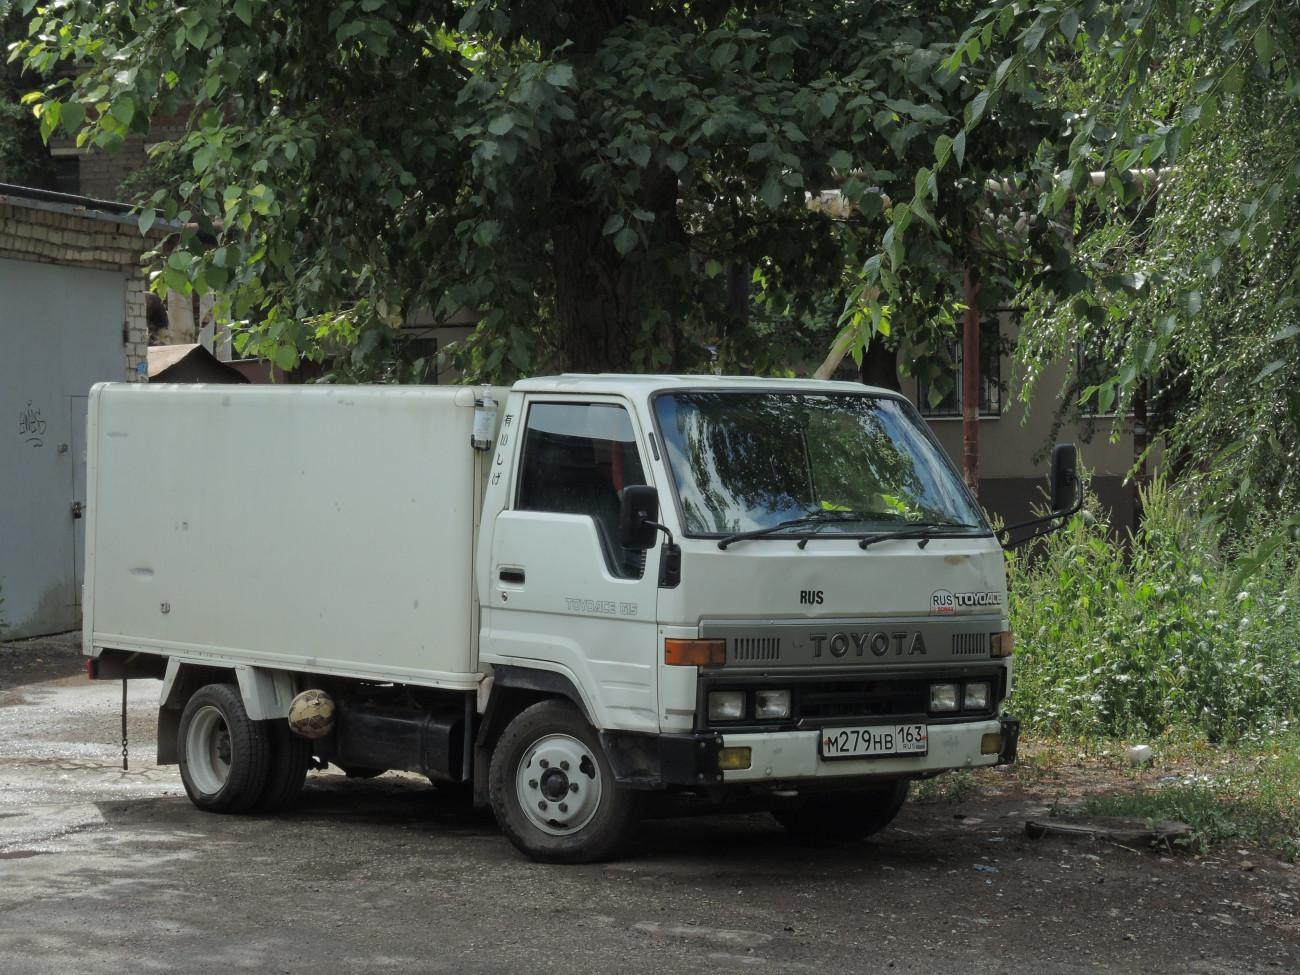 фургон на шасси Toyota Toyoace #М279НВ163. г. Самара,пр. Масленникова